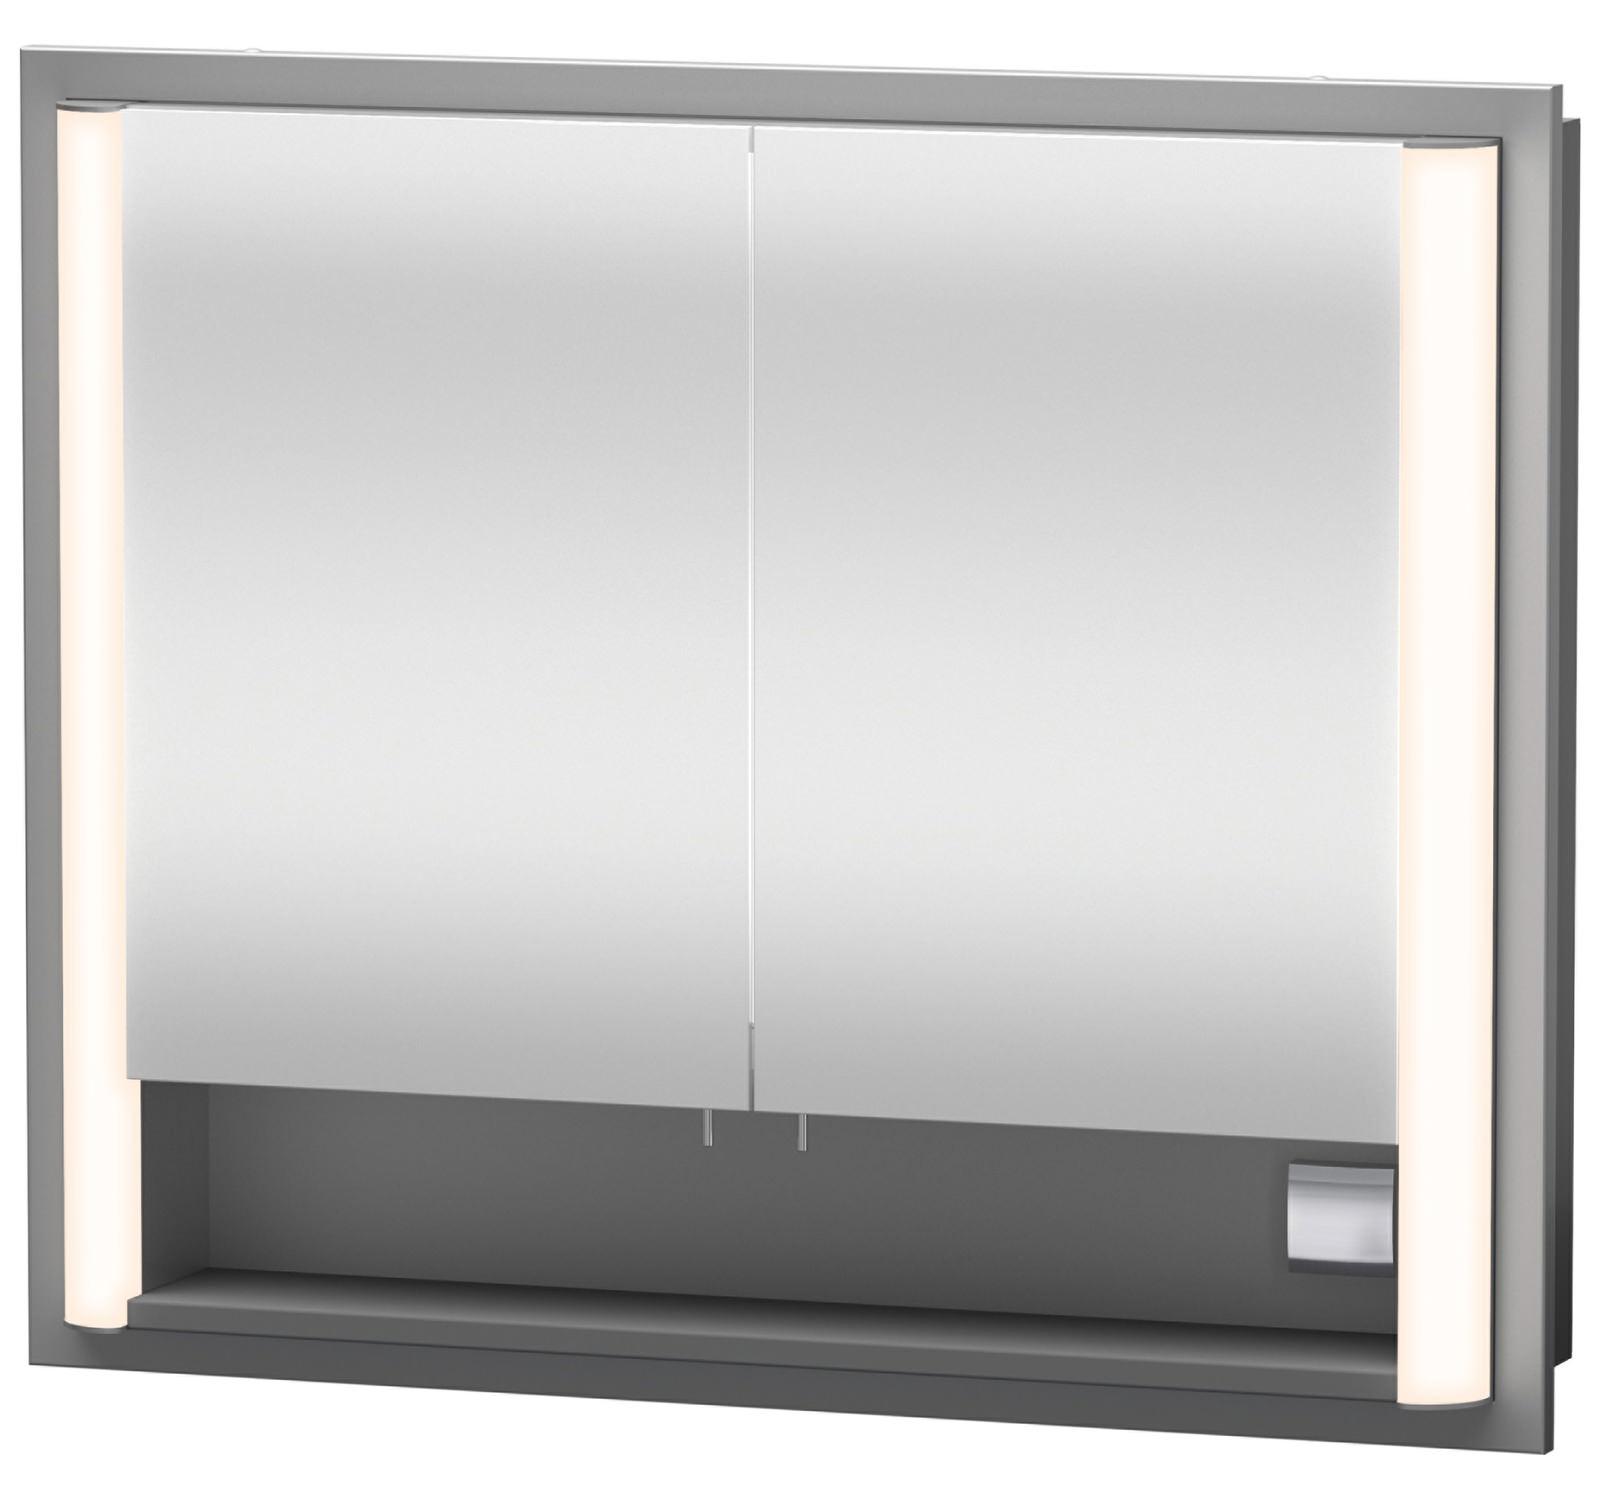 Duravit 660mm Height Aluminium White Built In Mirror